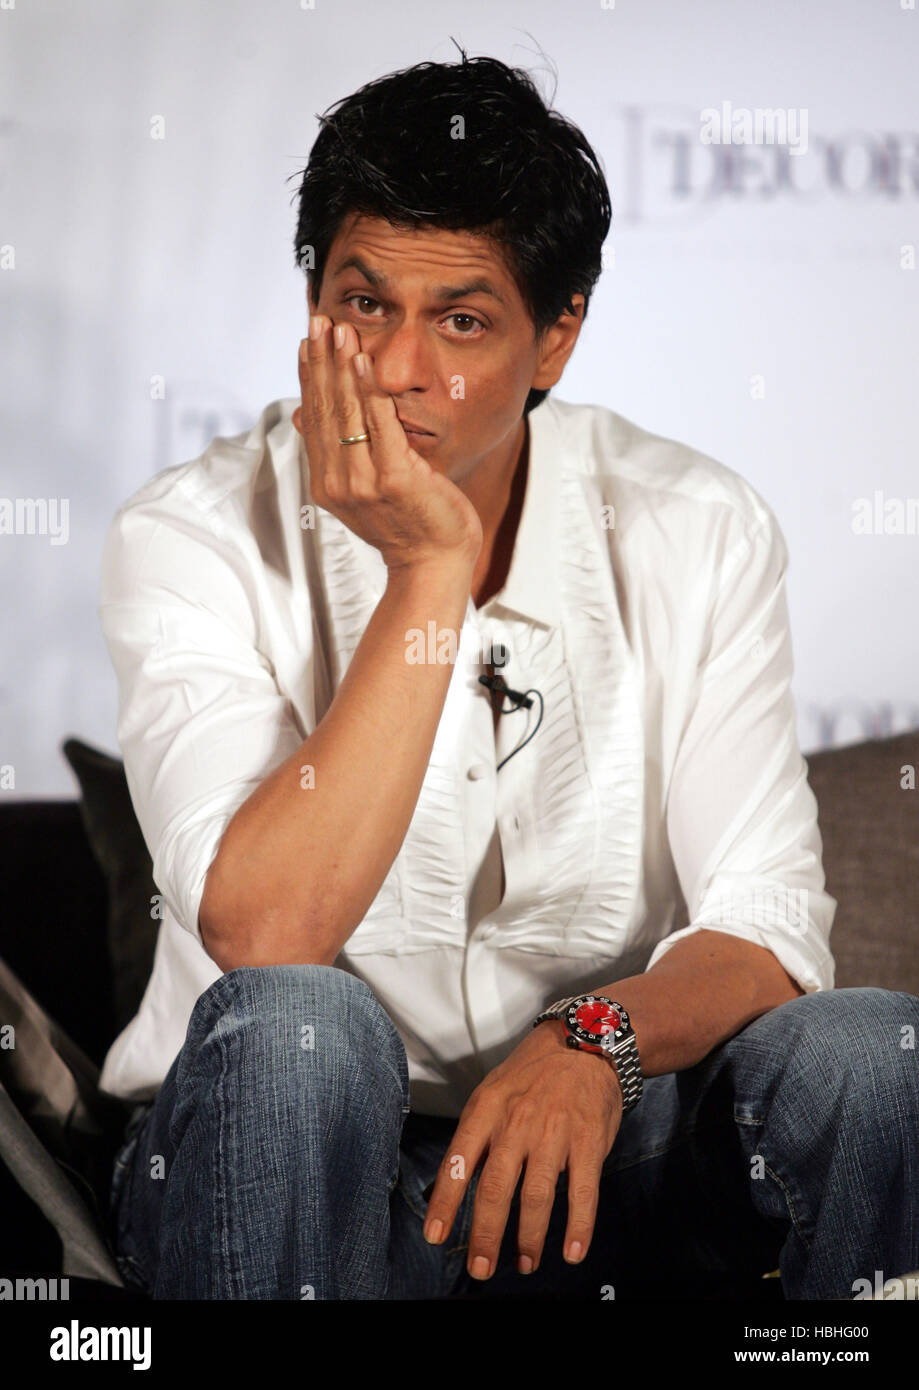 Bollywood actor Shah Rukh Khan brand ambassadors D Décor, speaks during launch D Décor fashion Indian homes Mumbai Stock Photo